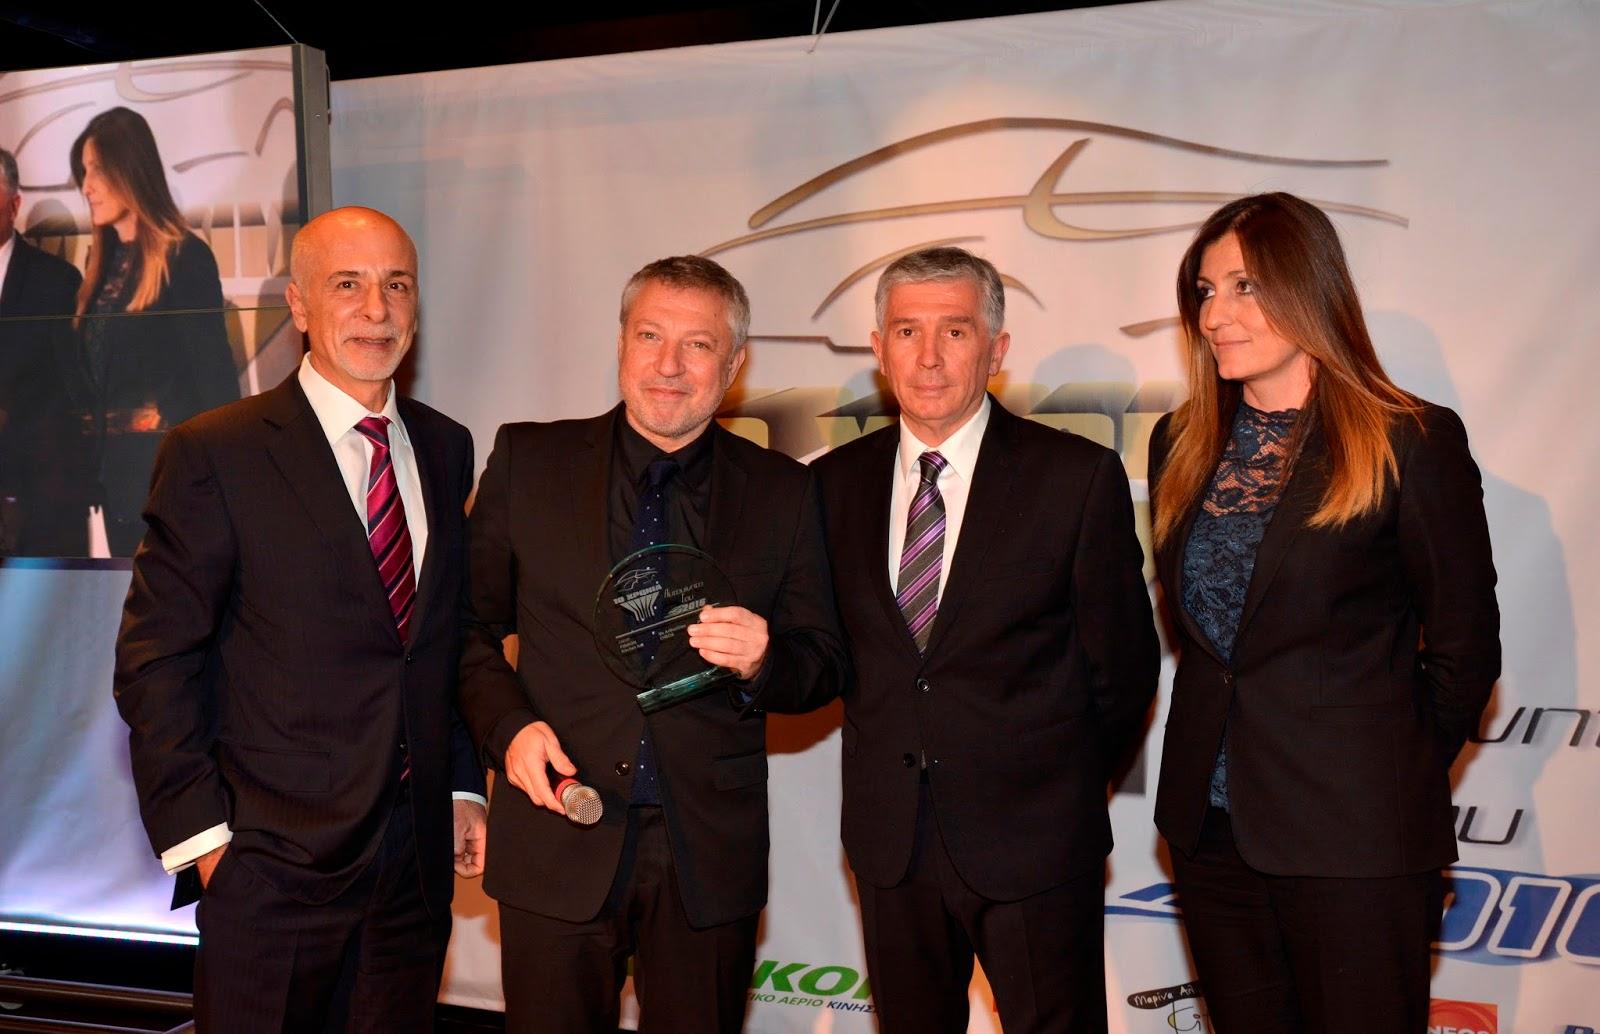 photo%2B2 To Jeep Renegade Αυτοκίνητο της χρονιάς για την Ελλάδα 2016! compact SUV, Jeep, Jeep Renegade, SUV, Αυτοκίνητο της χρονιάς, Έλληνικο Αυτοκίνητο της χρονιάς